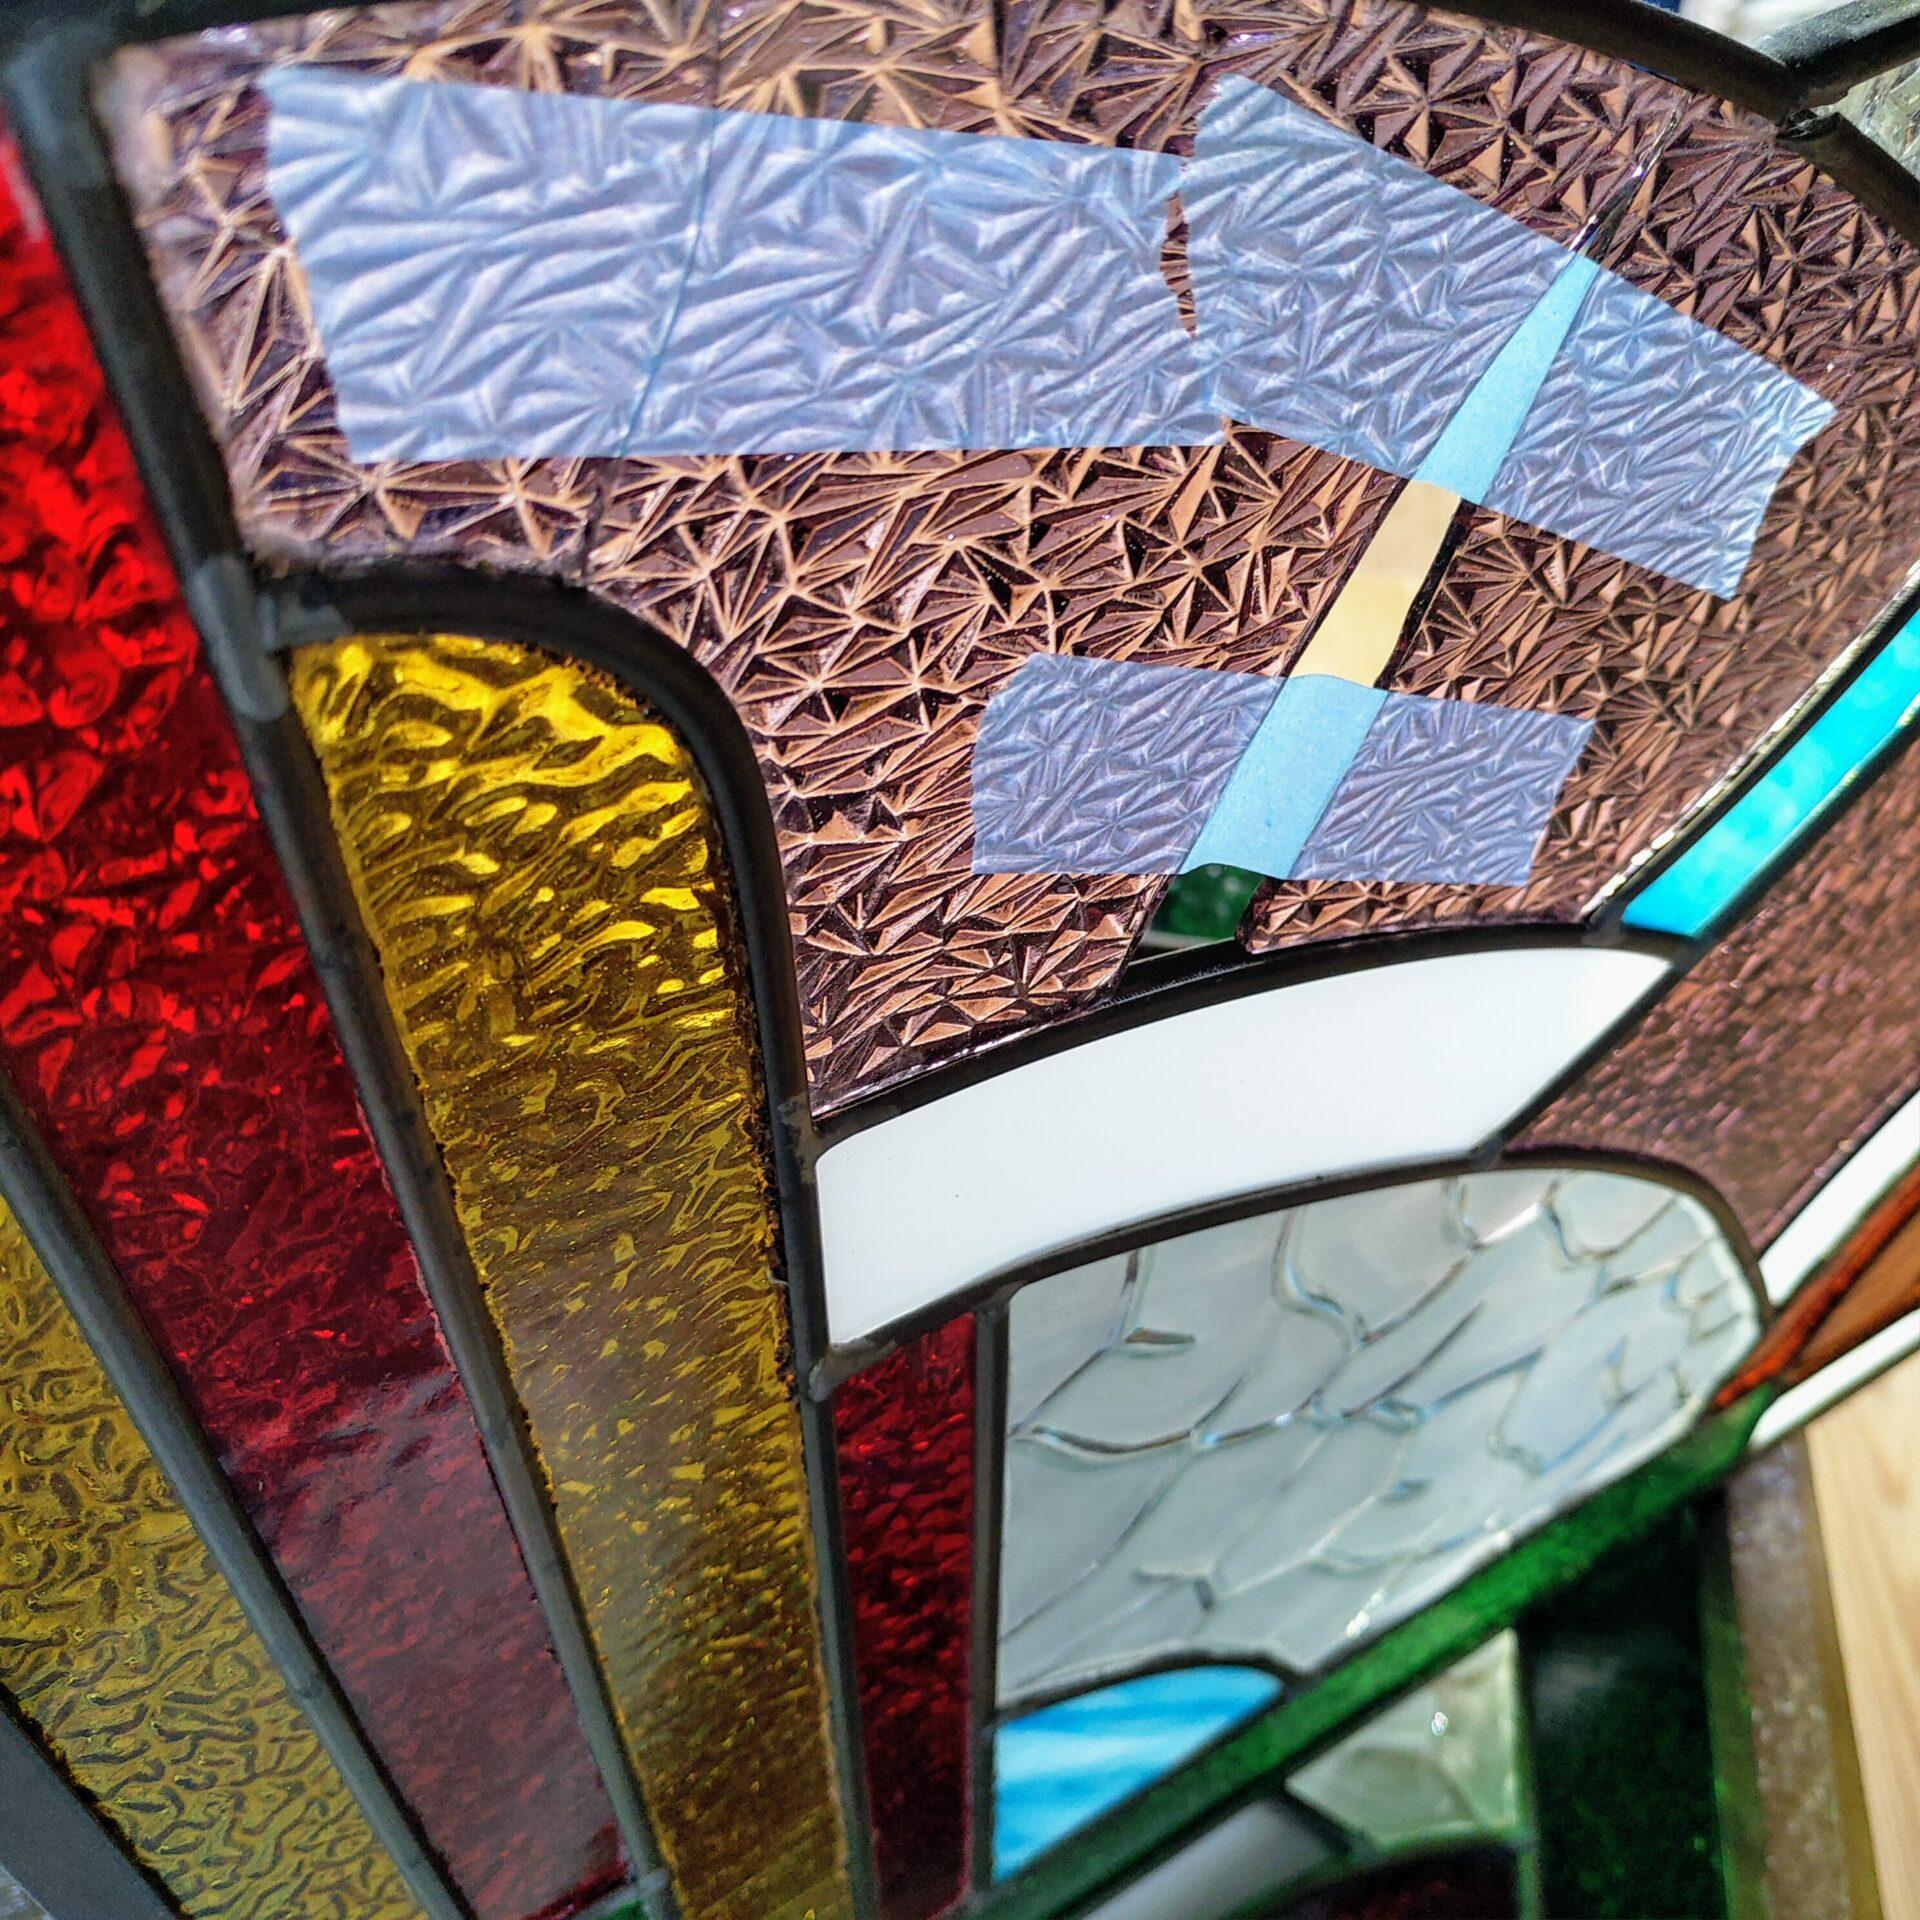 Gebroken glasraam vitrail cassé broken stained glass art deco